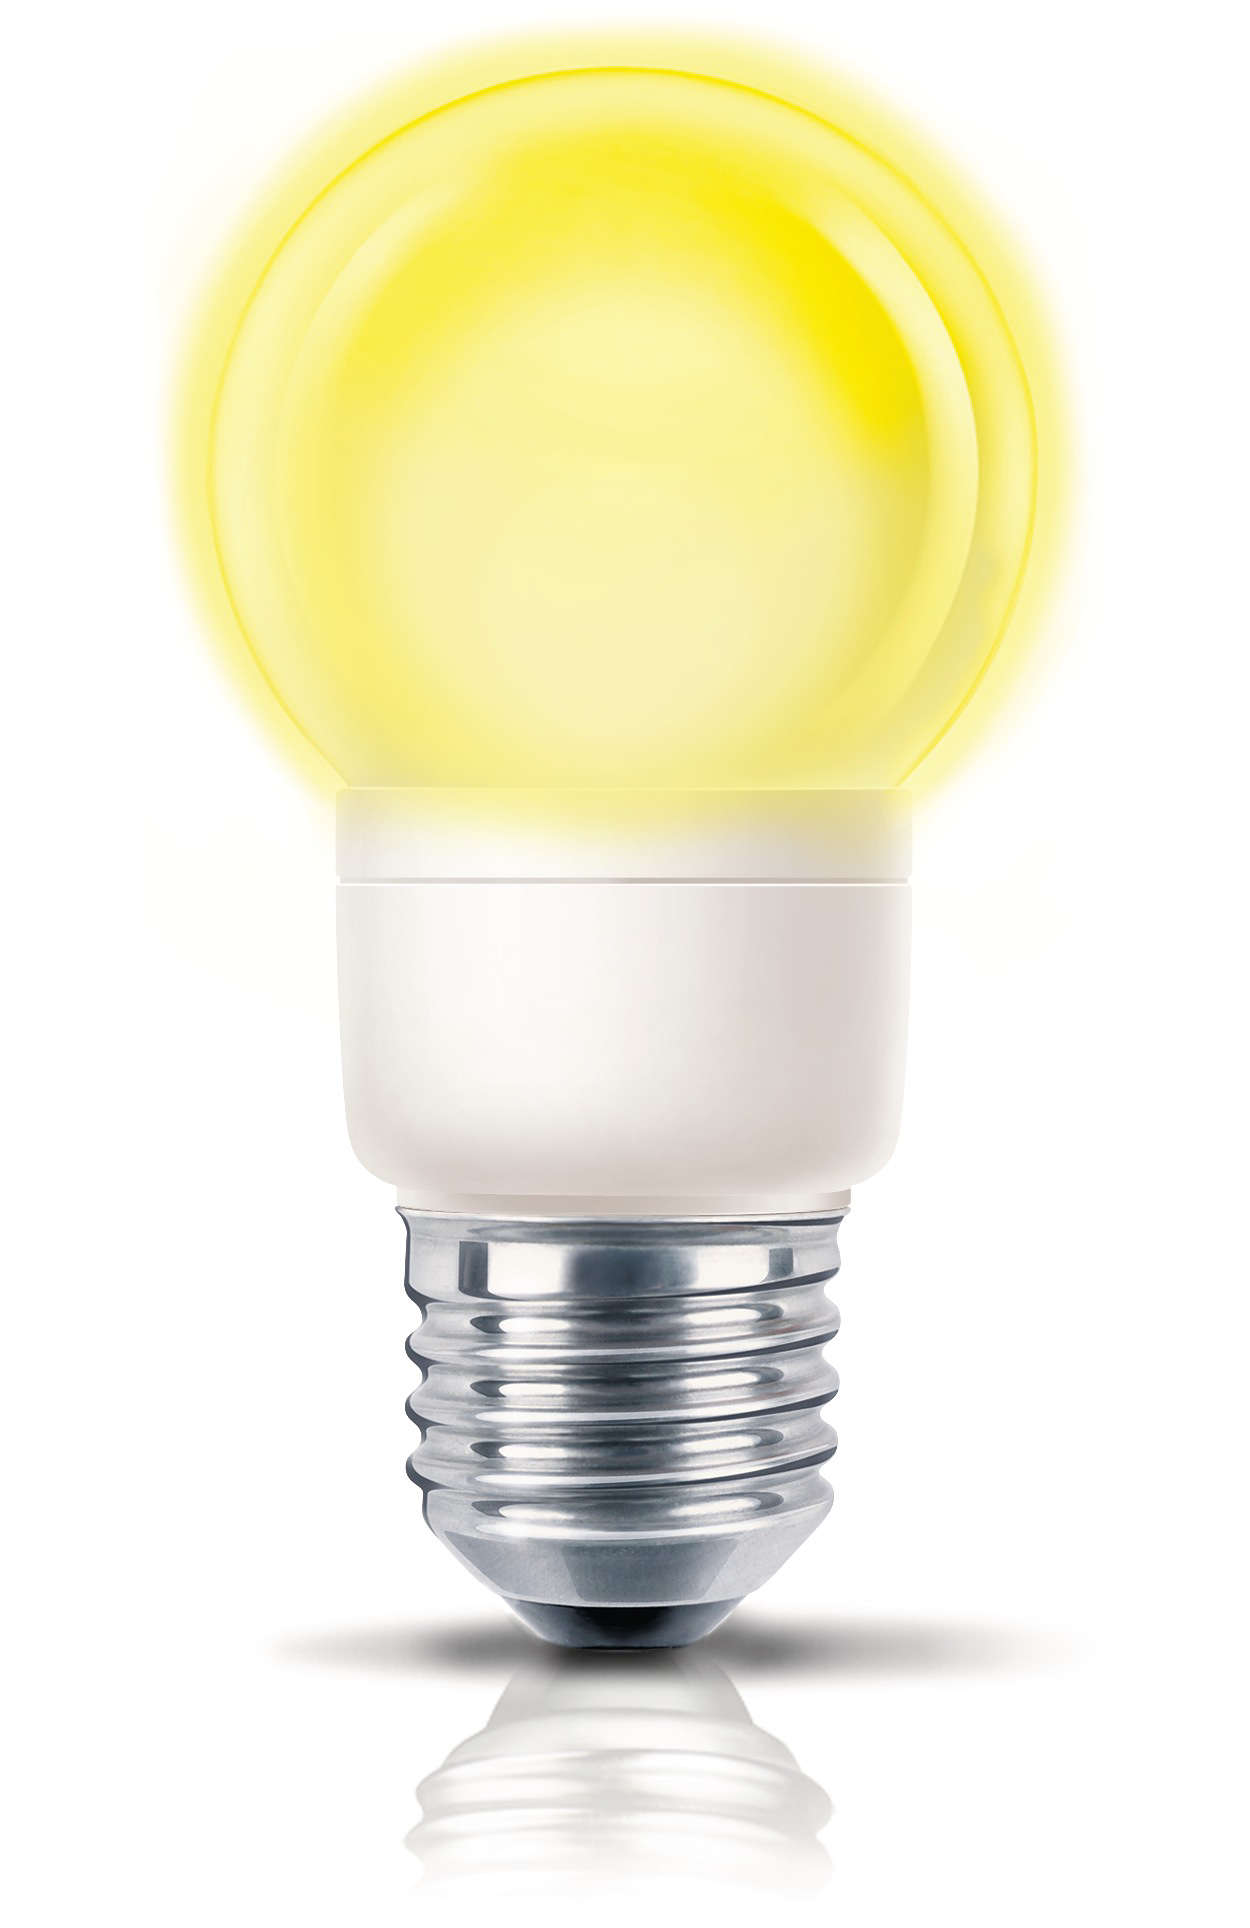 Lekent farget lys